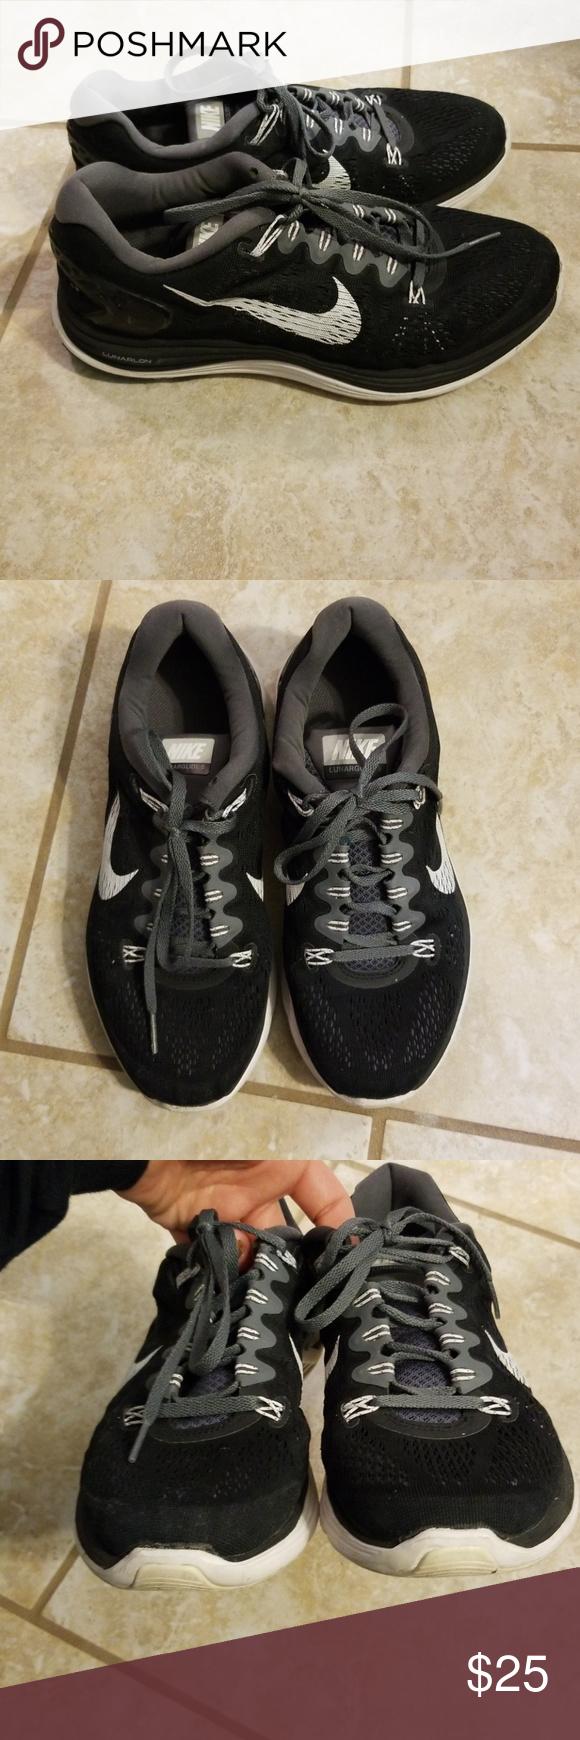 43658882a8228 Nike Lunarglide 5 Womens size 9.5 black nike lunarglide 5. Shows wear